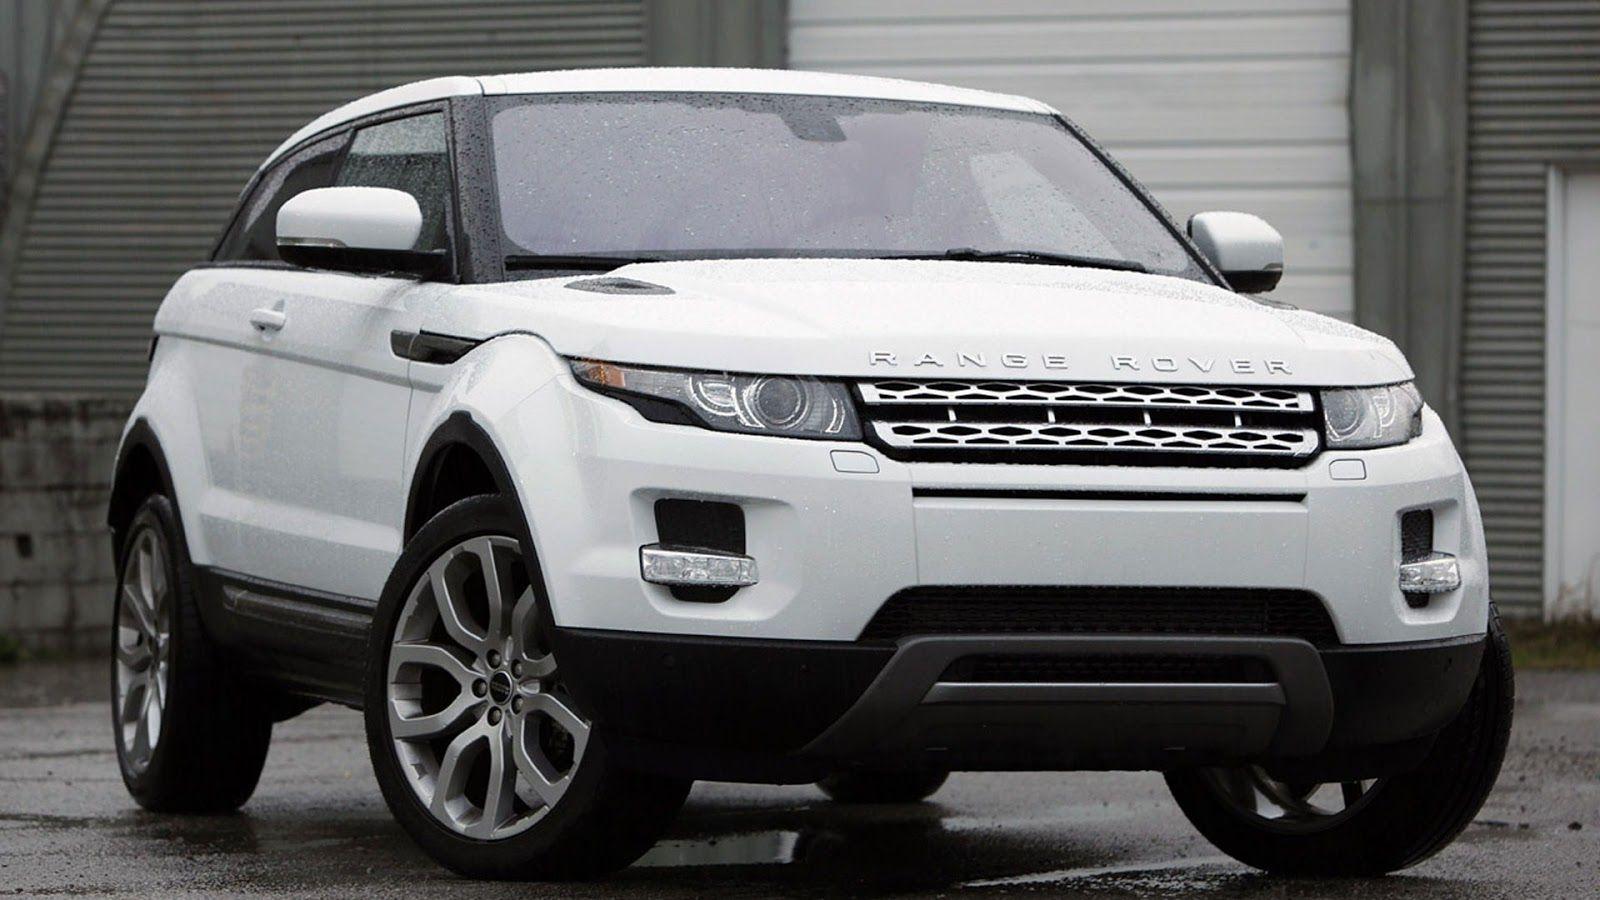 Range Rover Evoque Short Reviews Pictures Auto Reviews